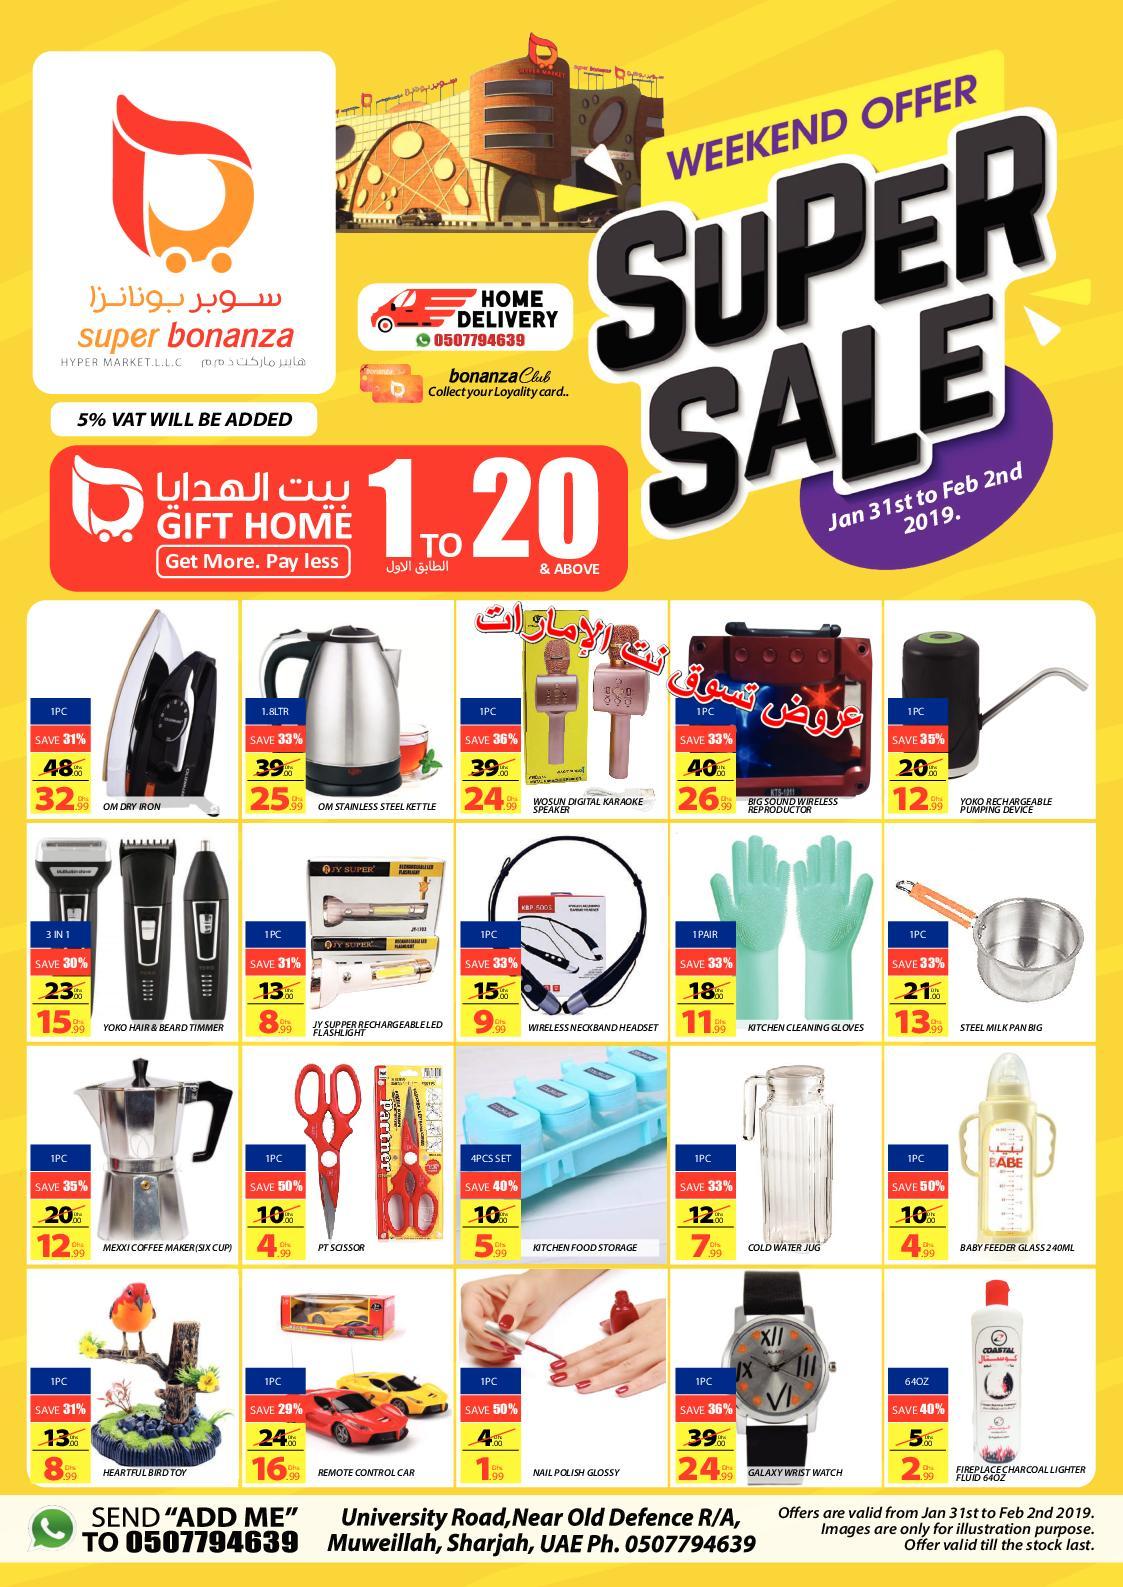 Calaméo - Tsawq Net Super Bonanza Hyper Sharjah Uae 31 1 2019